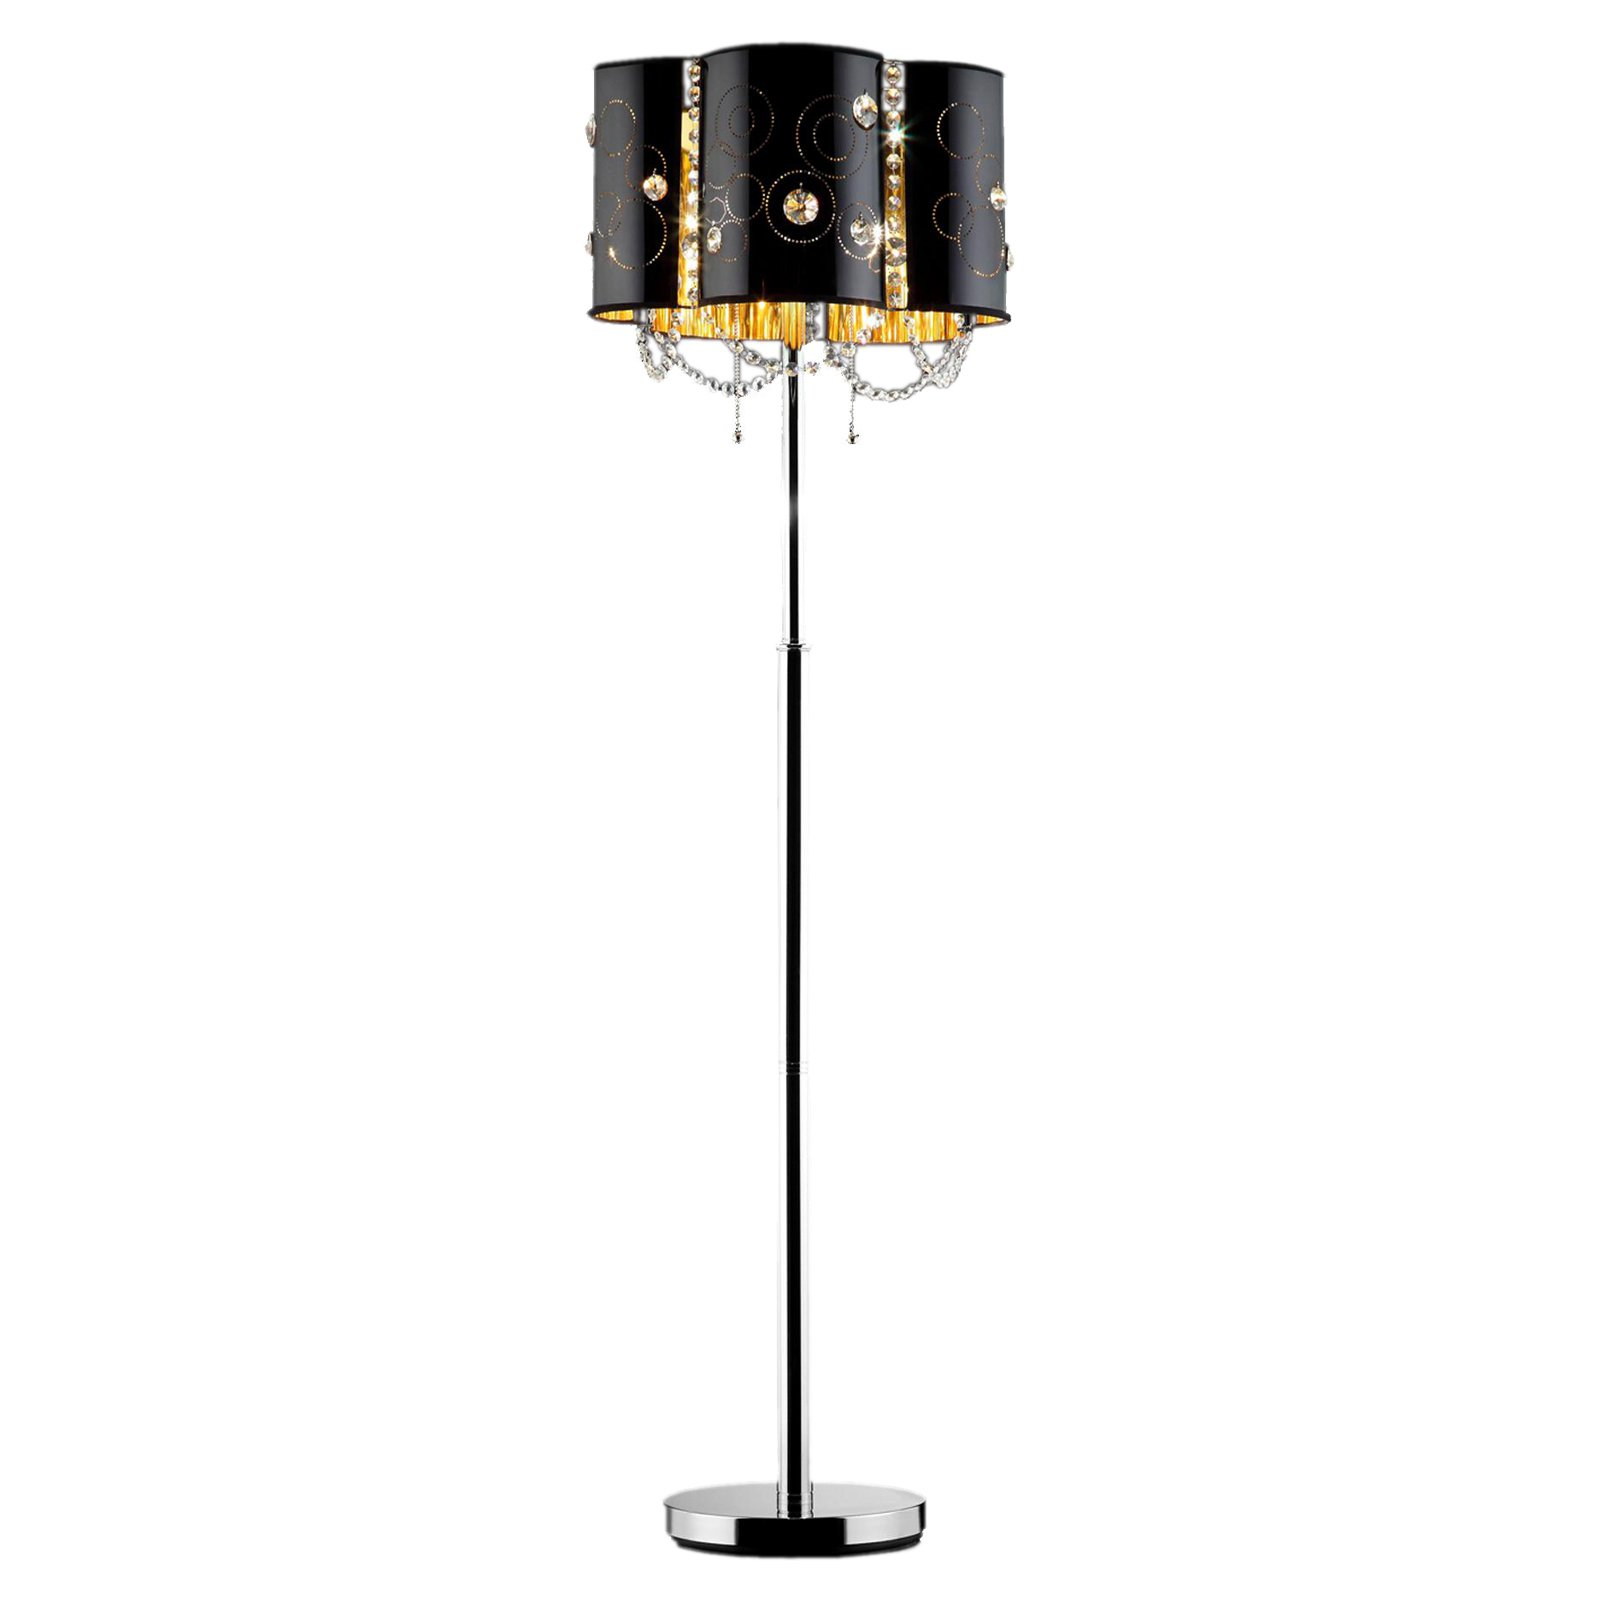 "Ore International 61"" Starry Night Floor Lamp image"